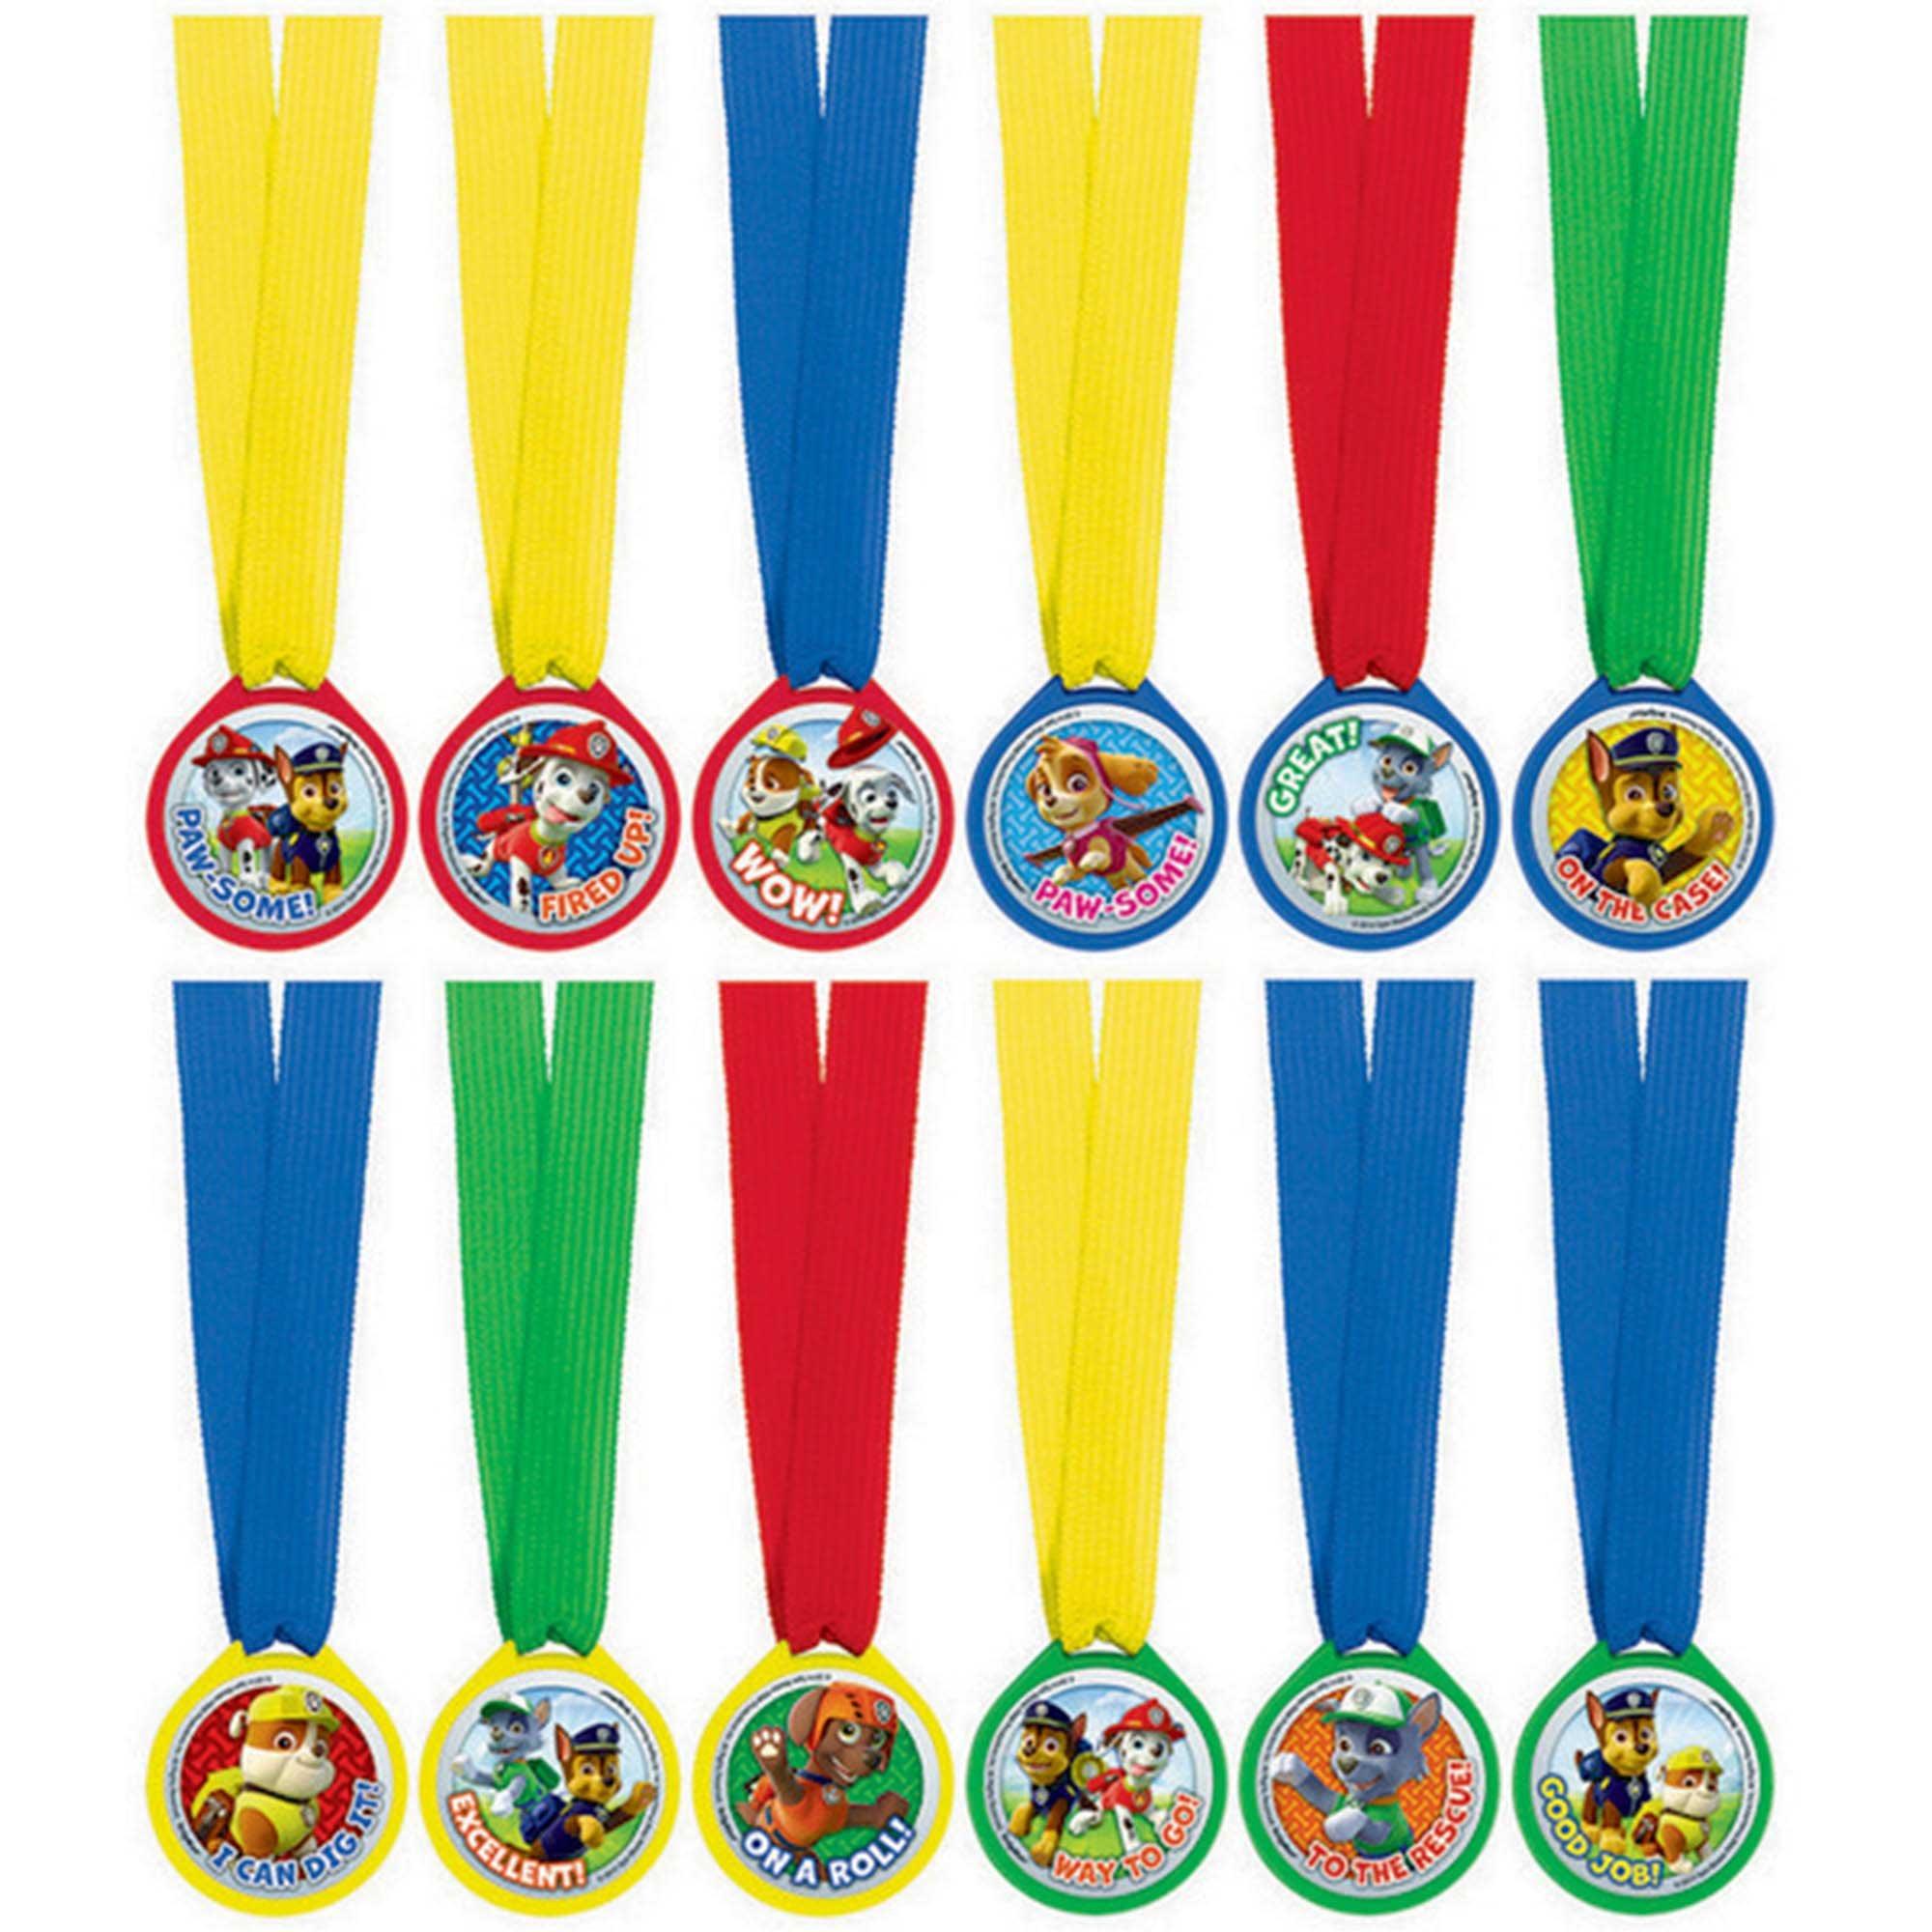 Paw Patrol Mini Award Medal Favors